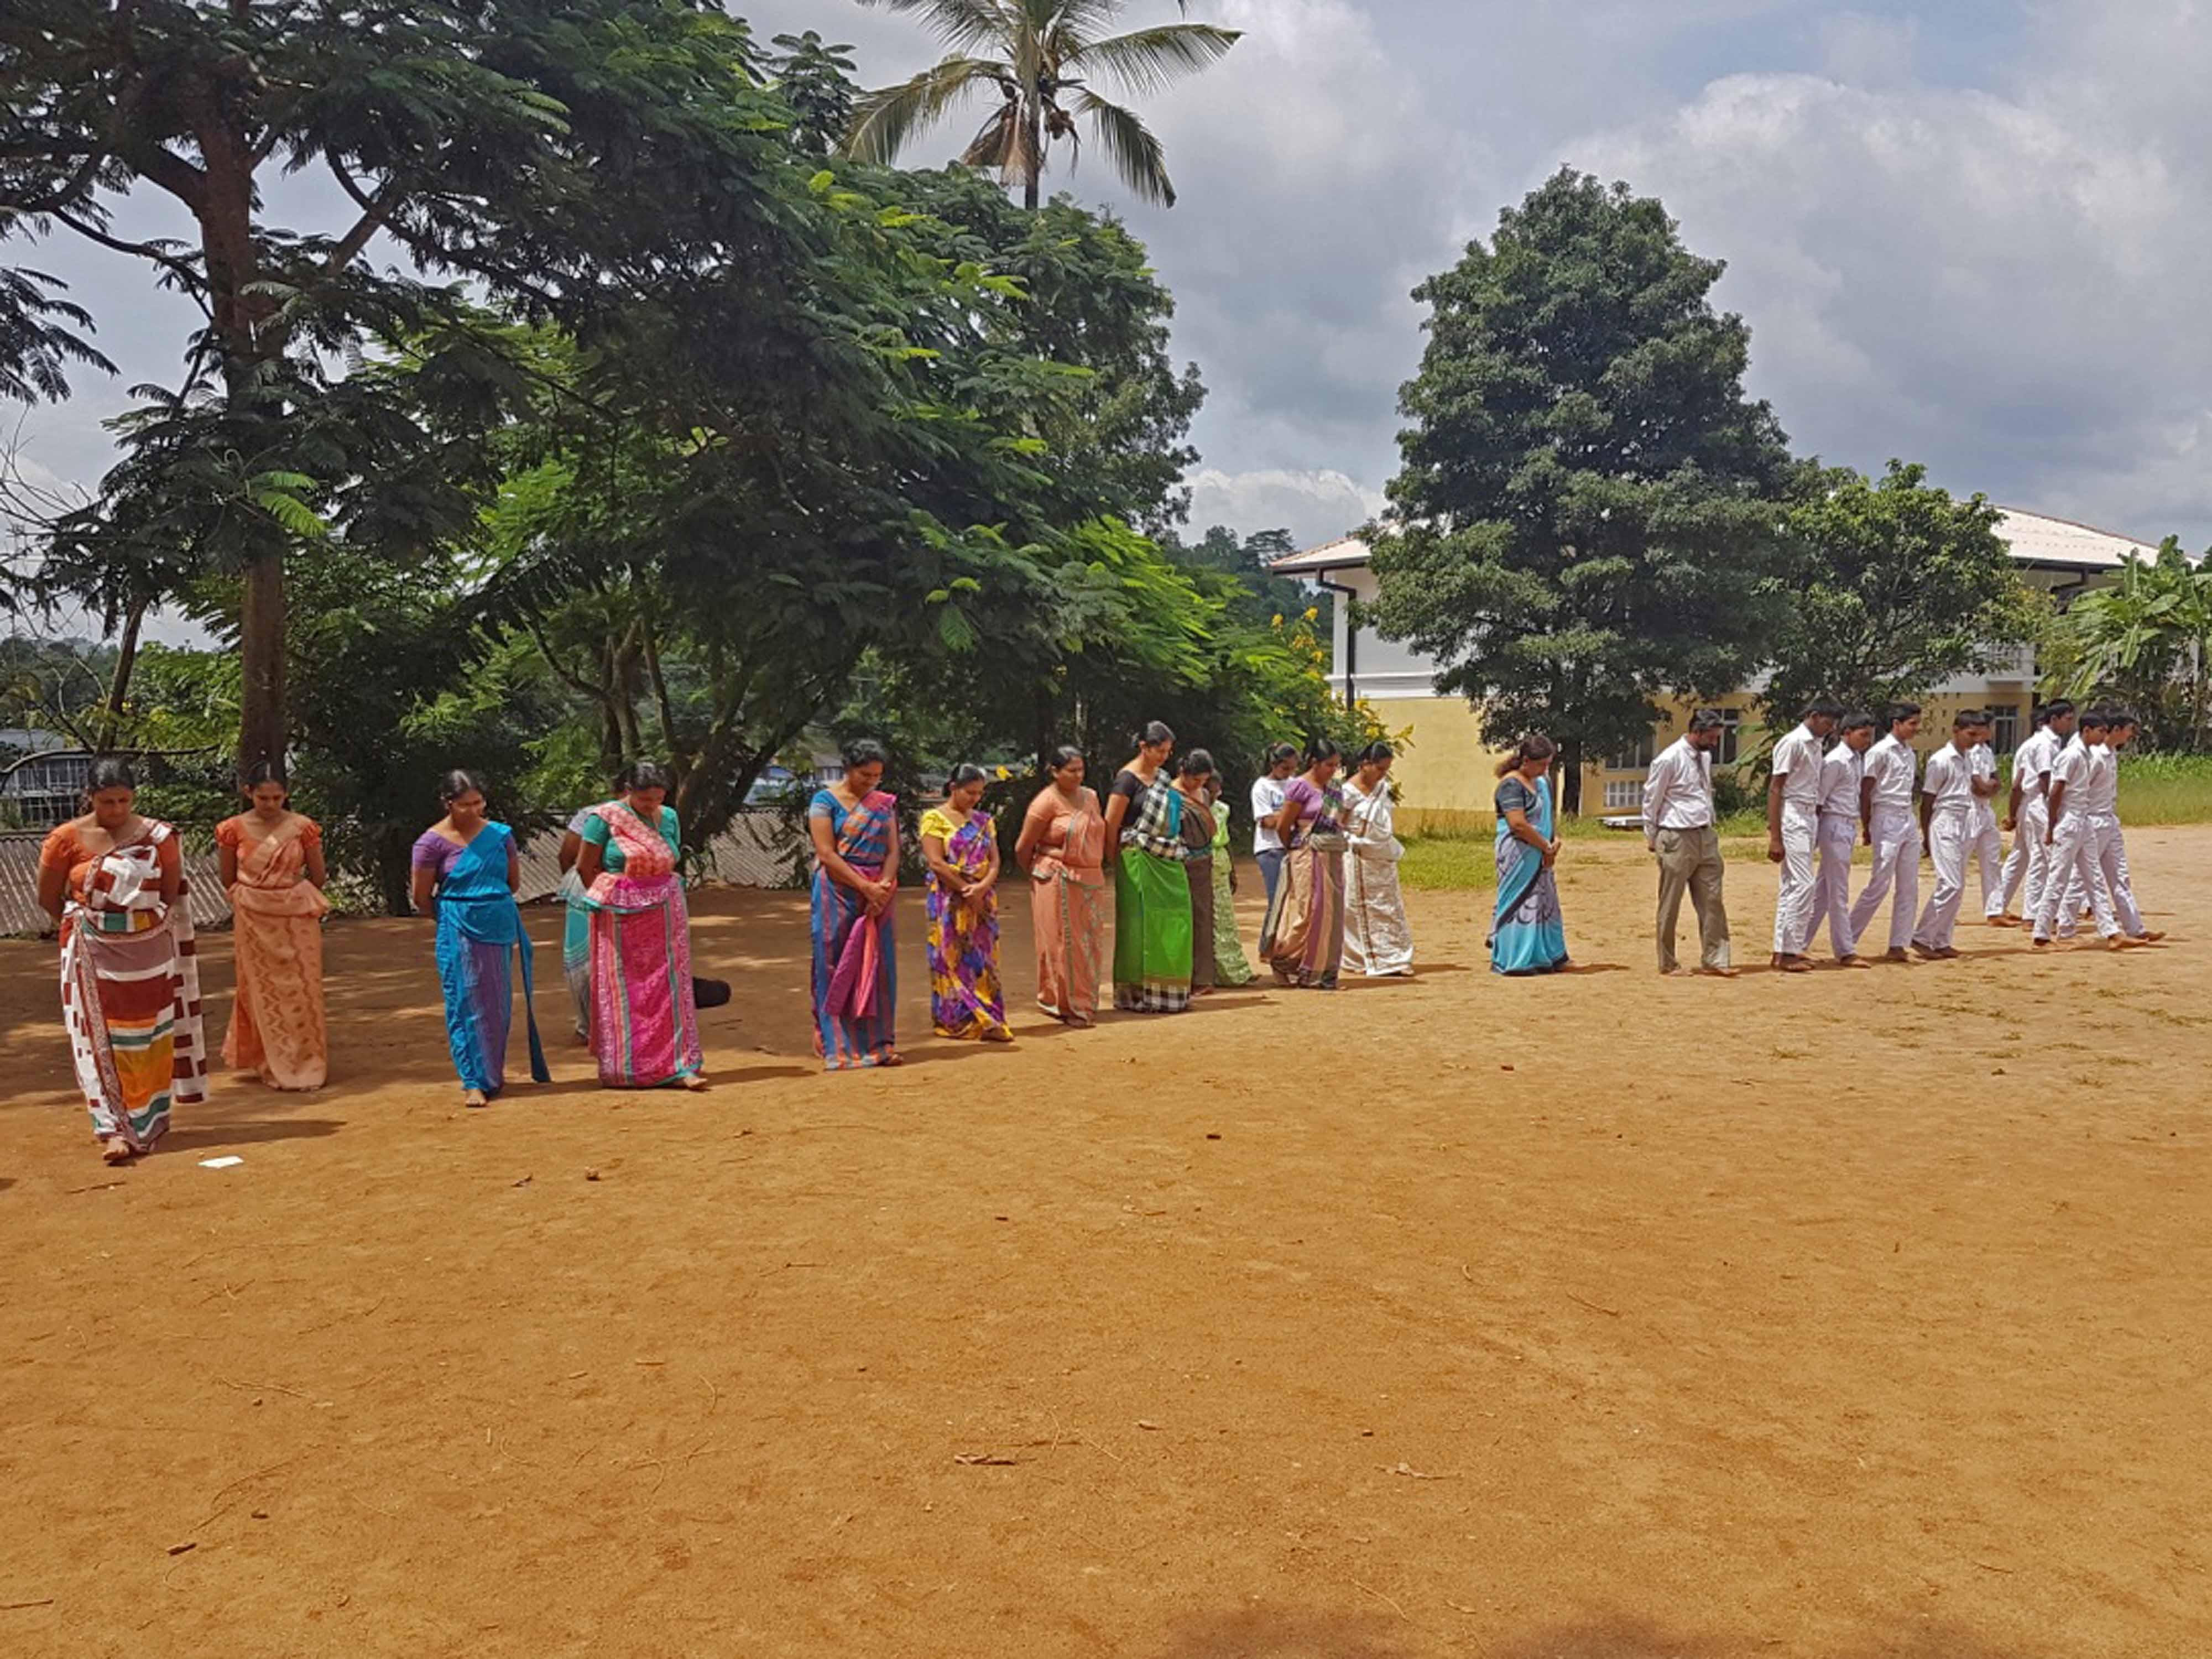 Sati Pasala program at Sri Swarnajothi Jathika Pasala - Kiribathkumbura